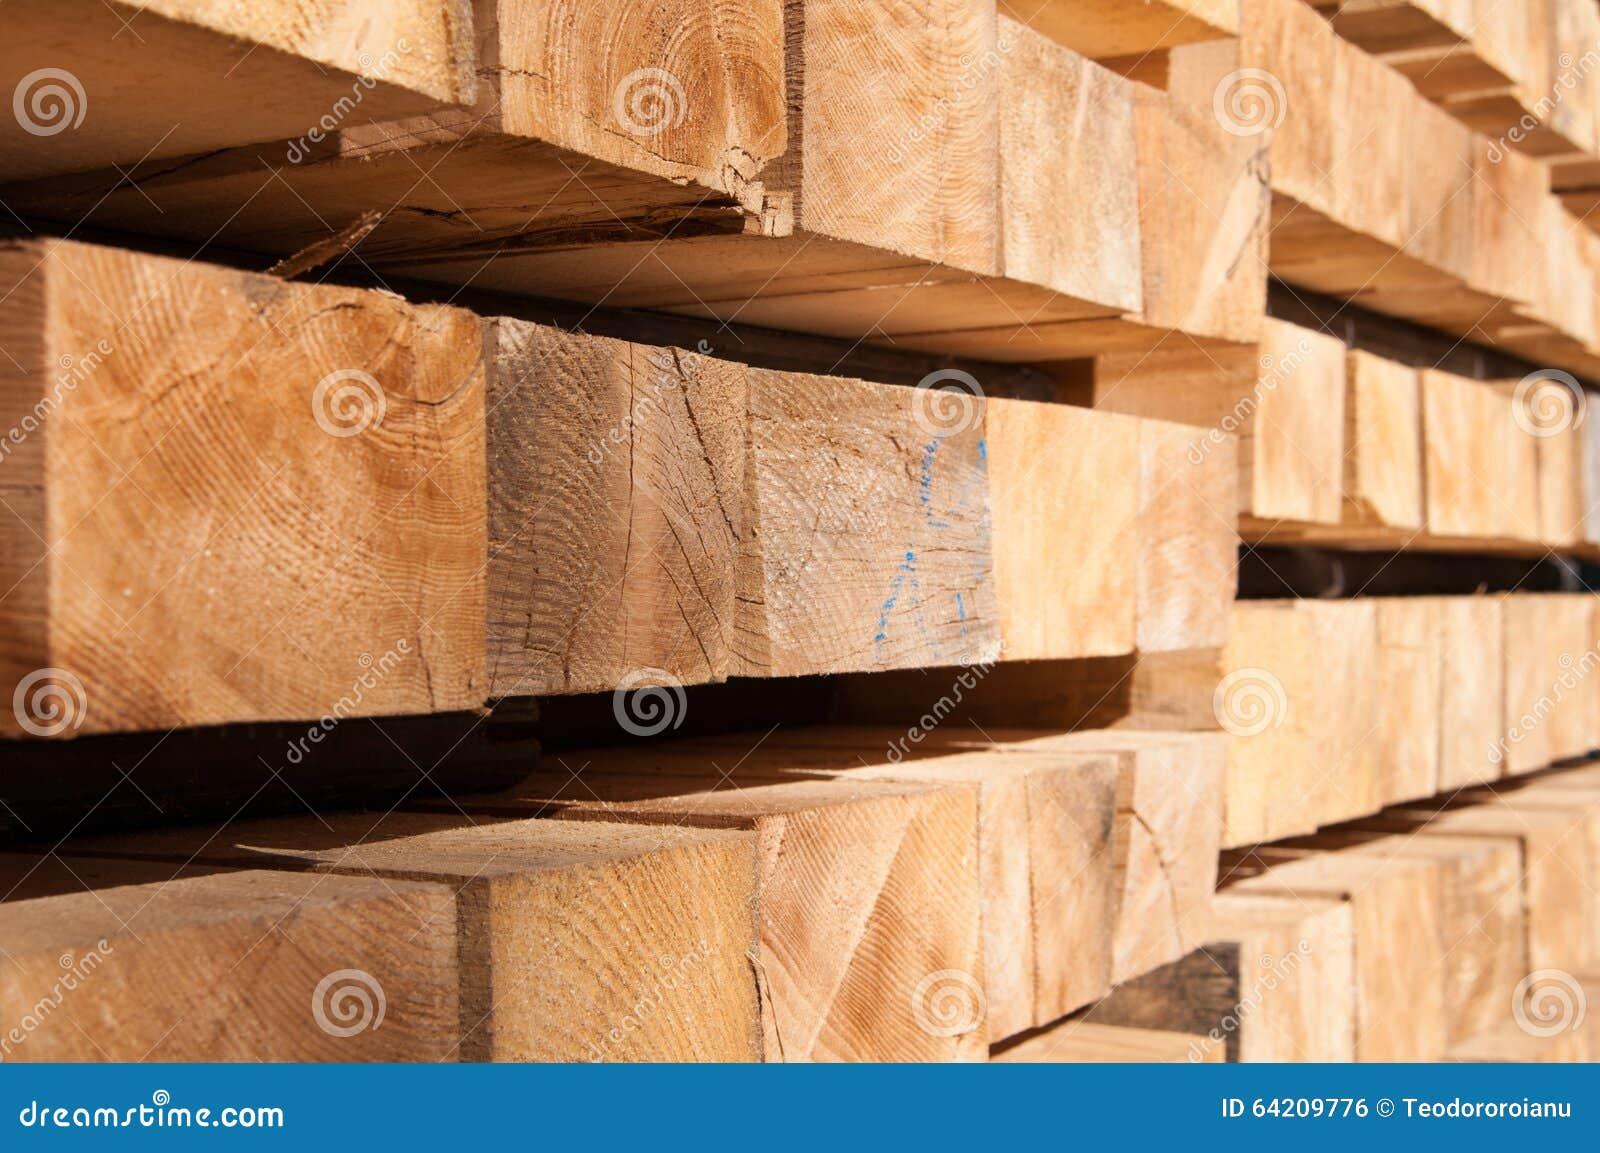 Wood Piling Construction : Construction wood pile stock photo image